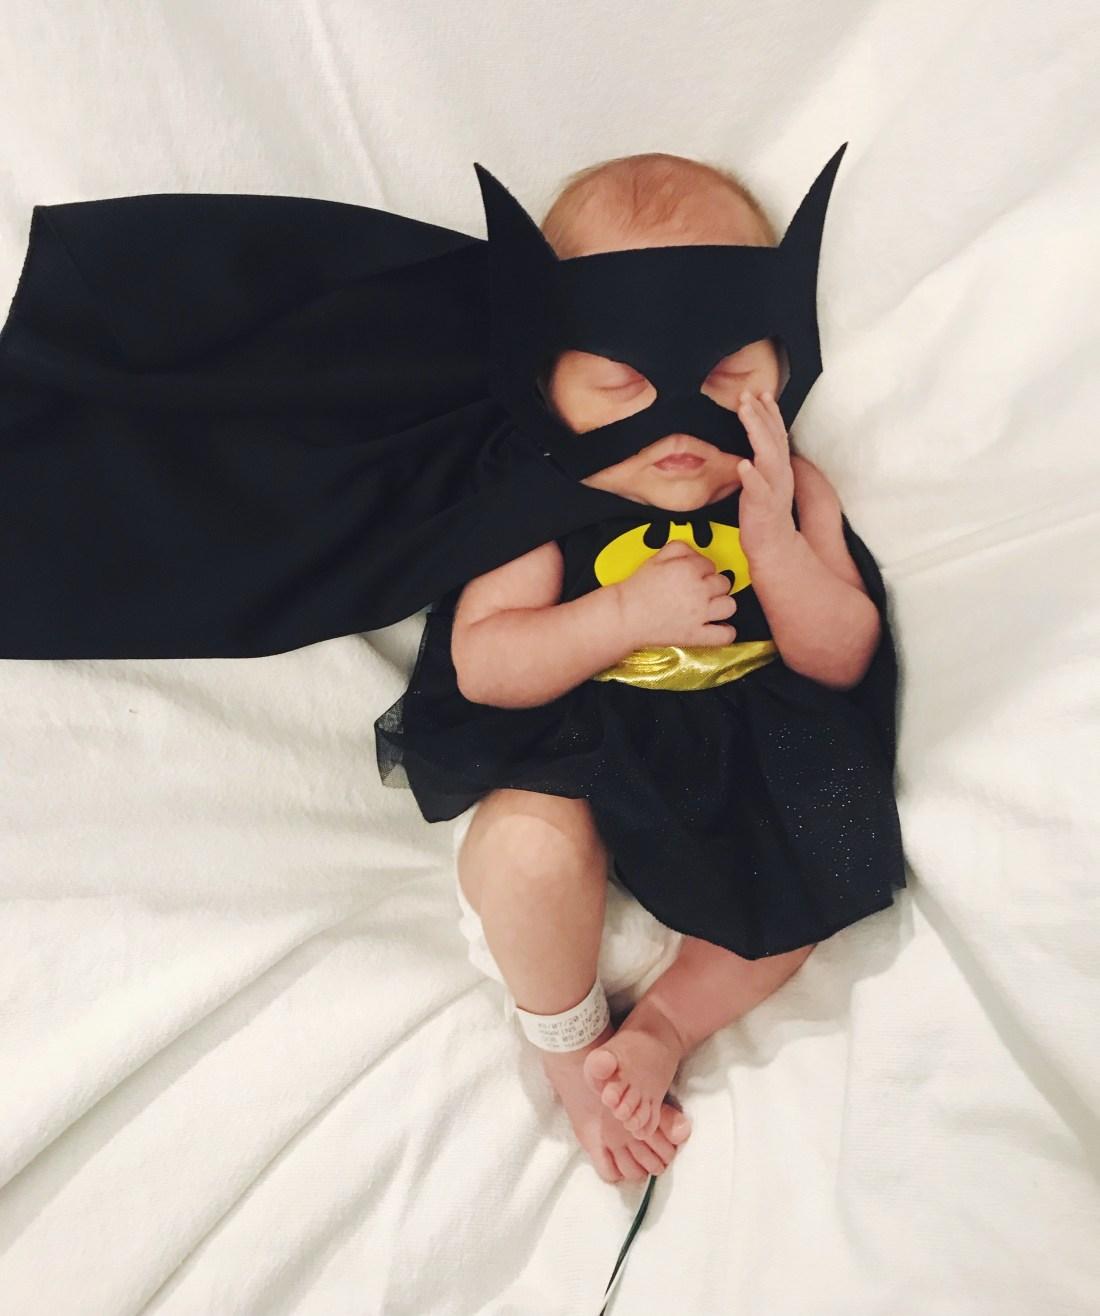 NICU Halloween Costume   Halloween Costume for Preemie Baby